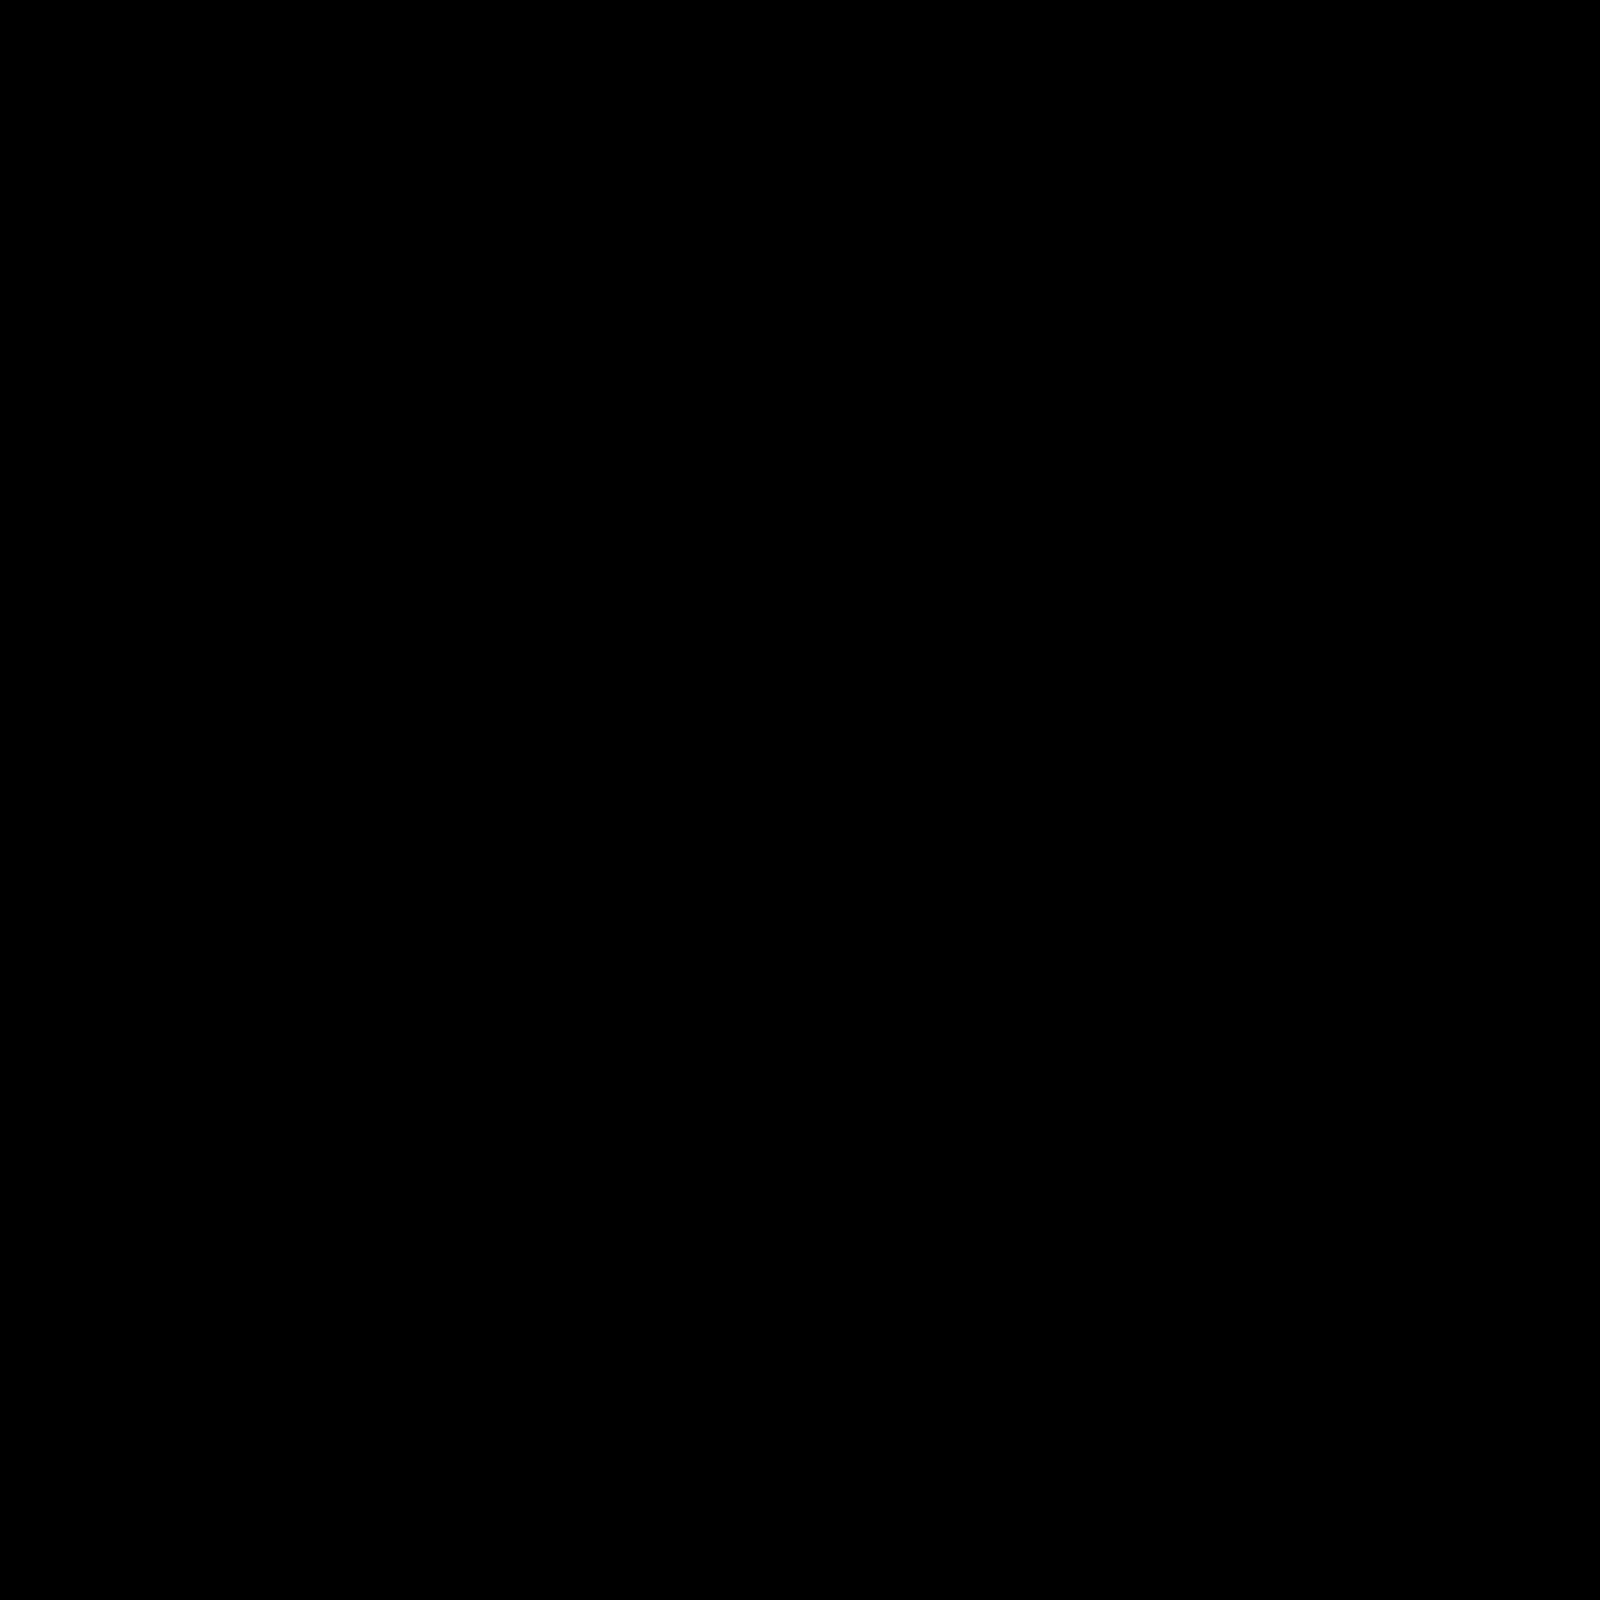 1600x1600 15 Camara Vector Symbol For Free Download On Mbtskoudsalg